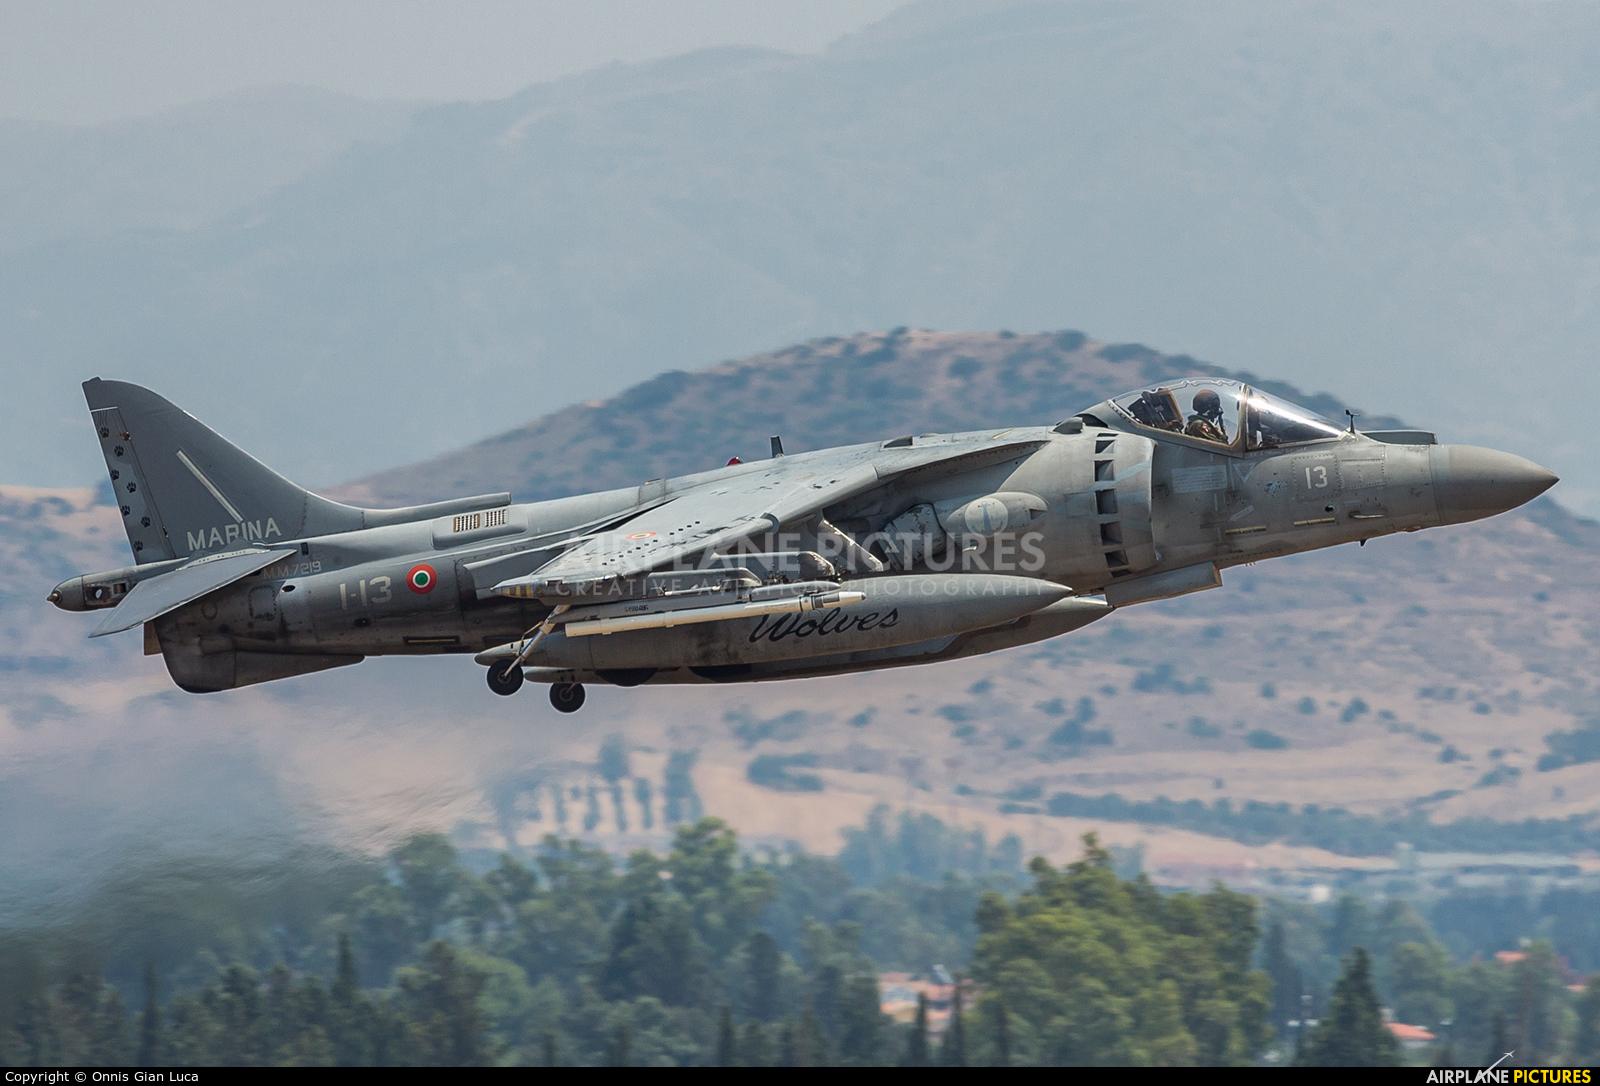 Italy - Navy MM7219 aircraft at Decimomannu